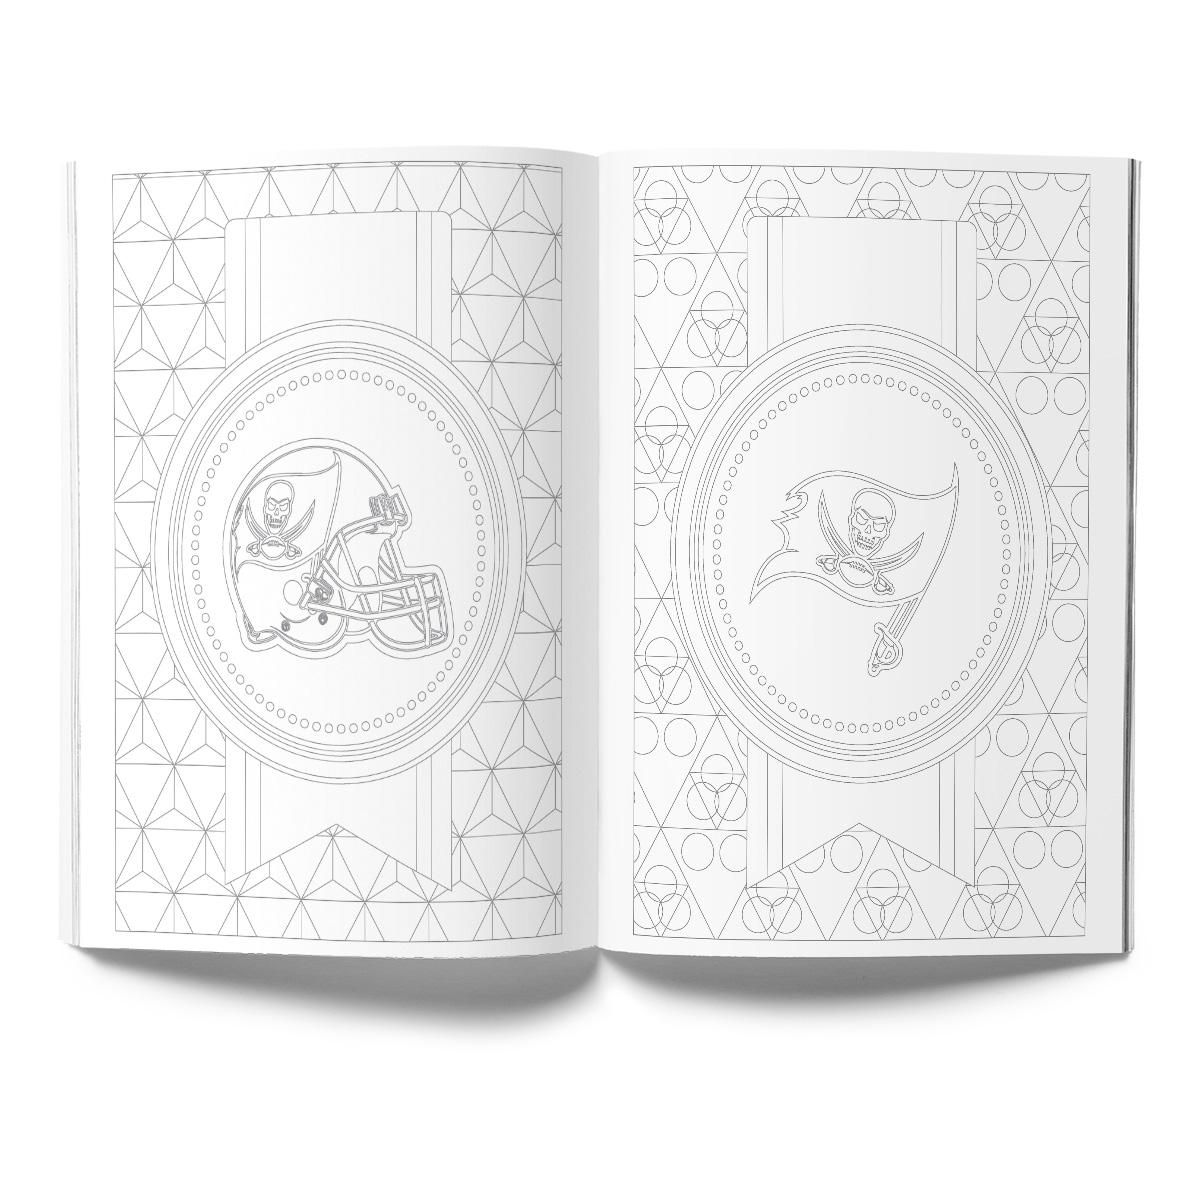 Tampa Bay Buccaneers Adult Coloring Book